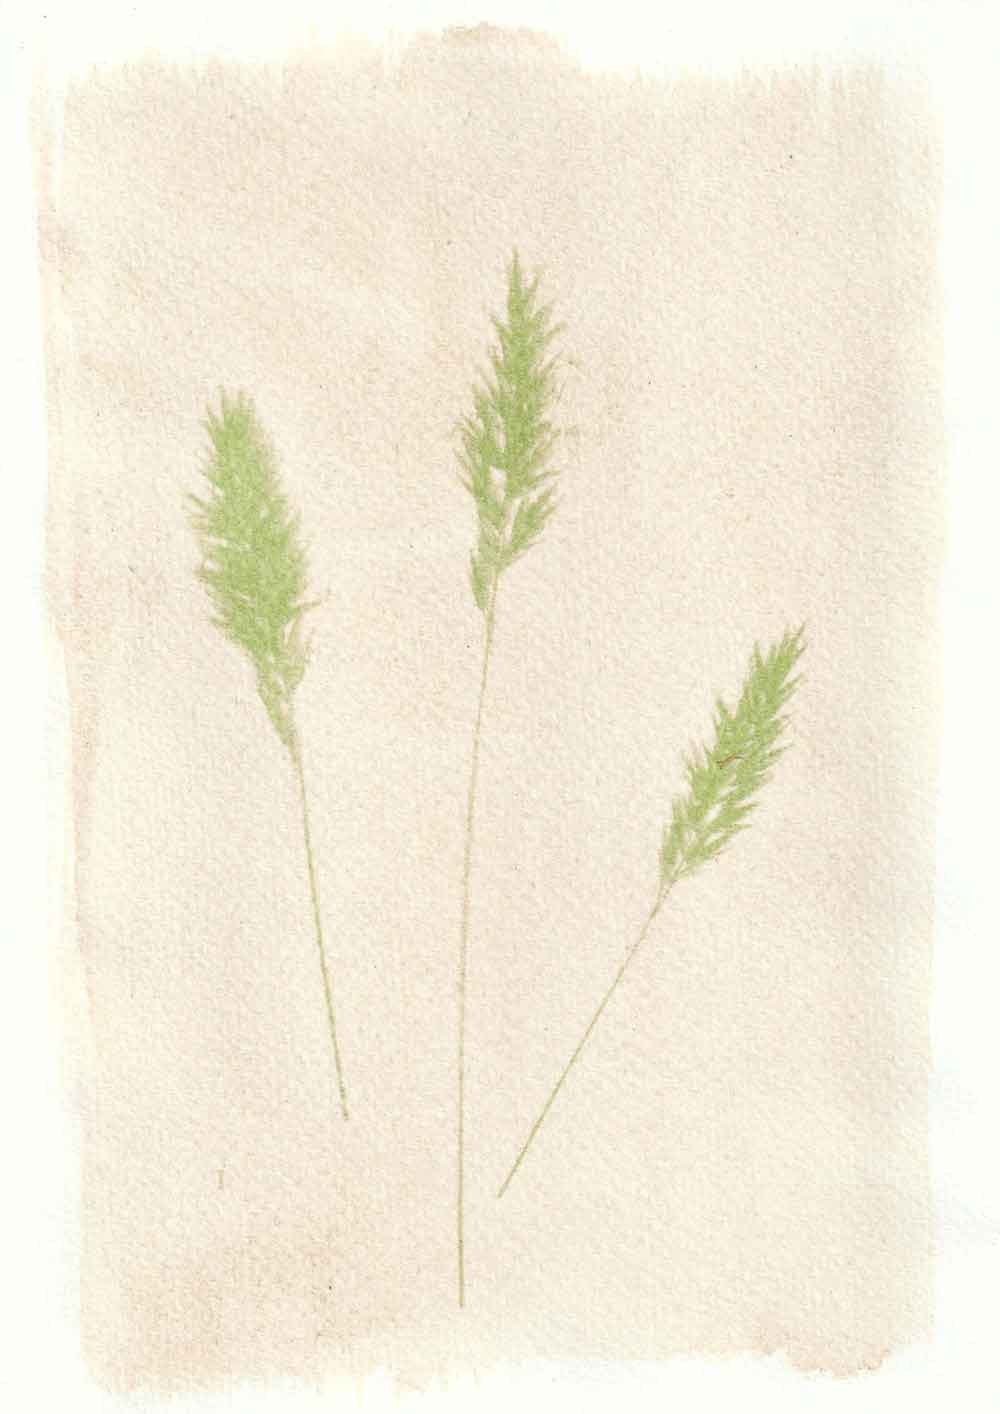 Wall barley anthotype prints by Tim Boddy